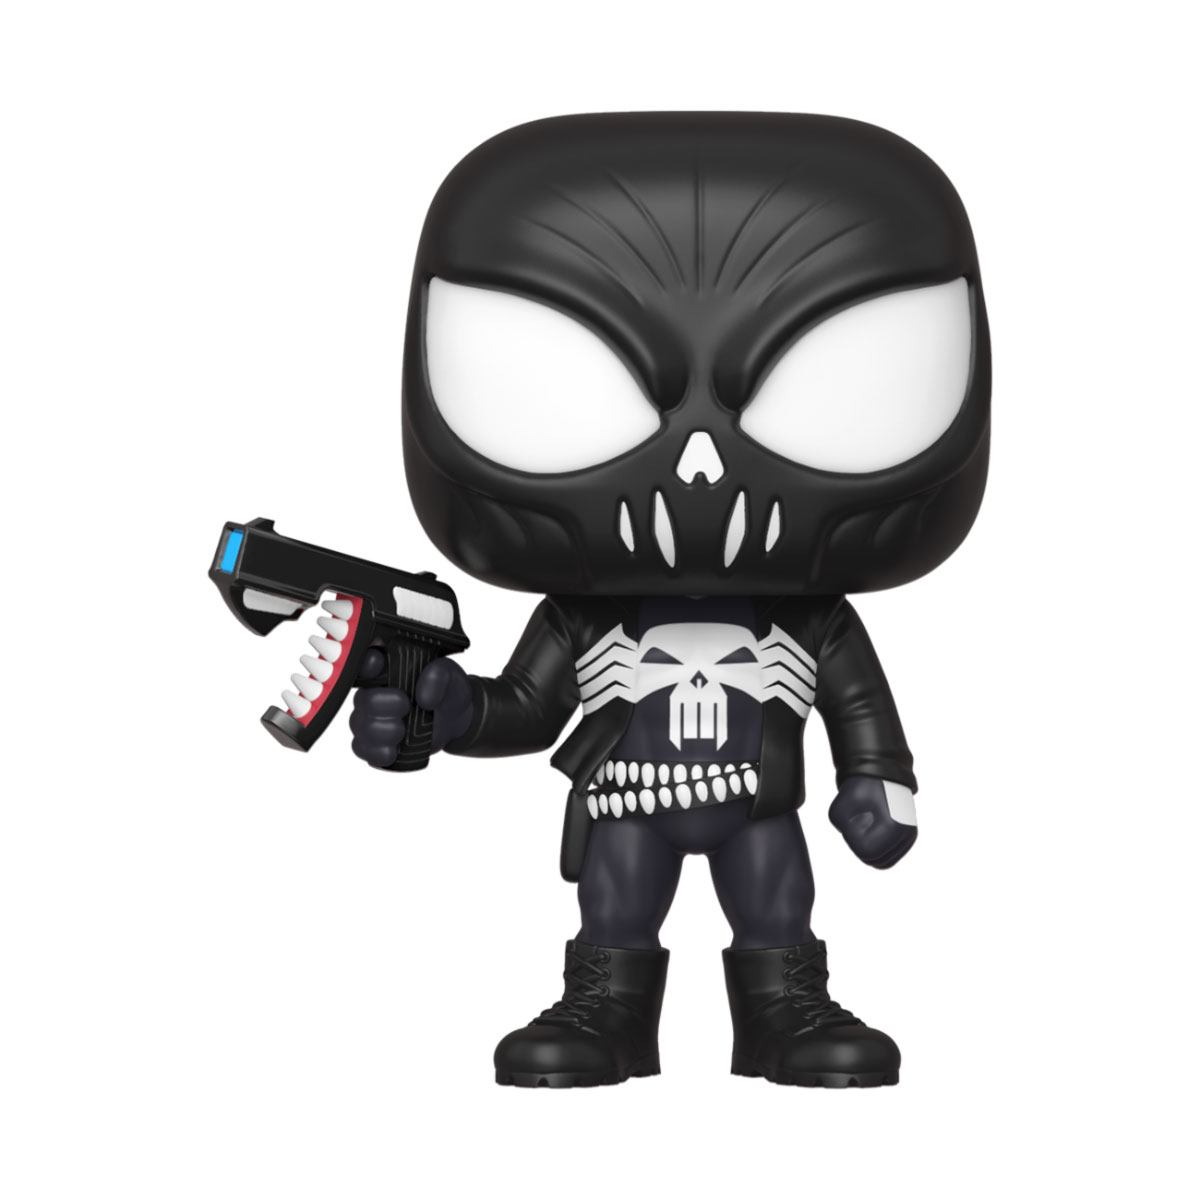 Marvel Venom POP! Marvel Vinyl Figure Punisher 9 cm